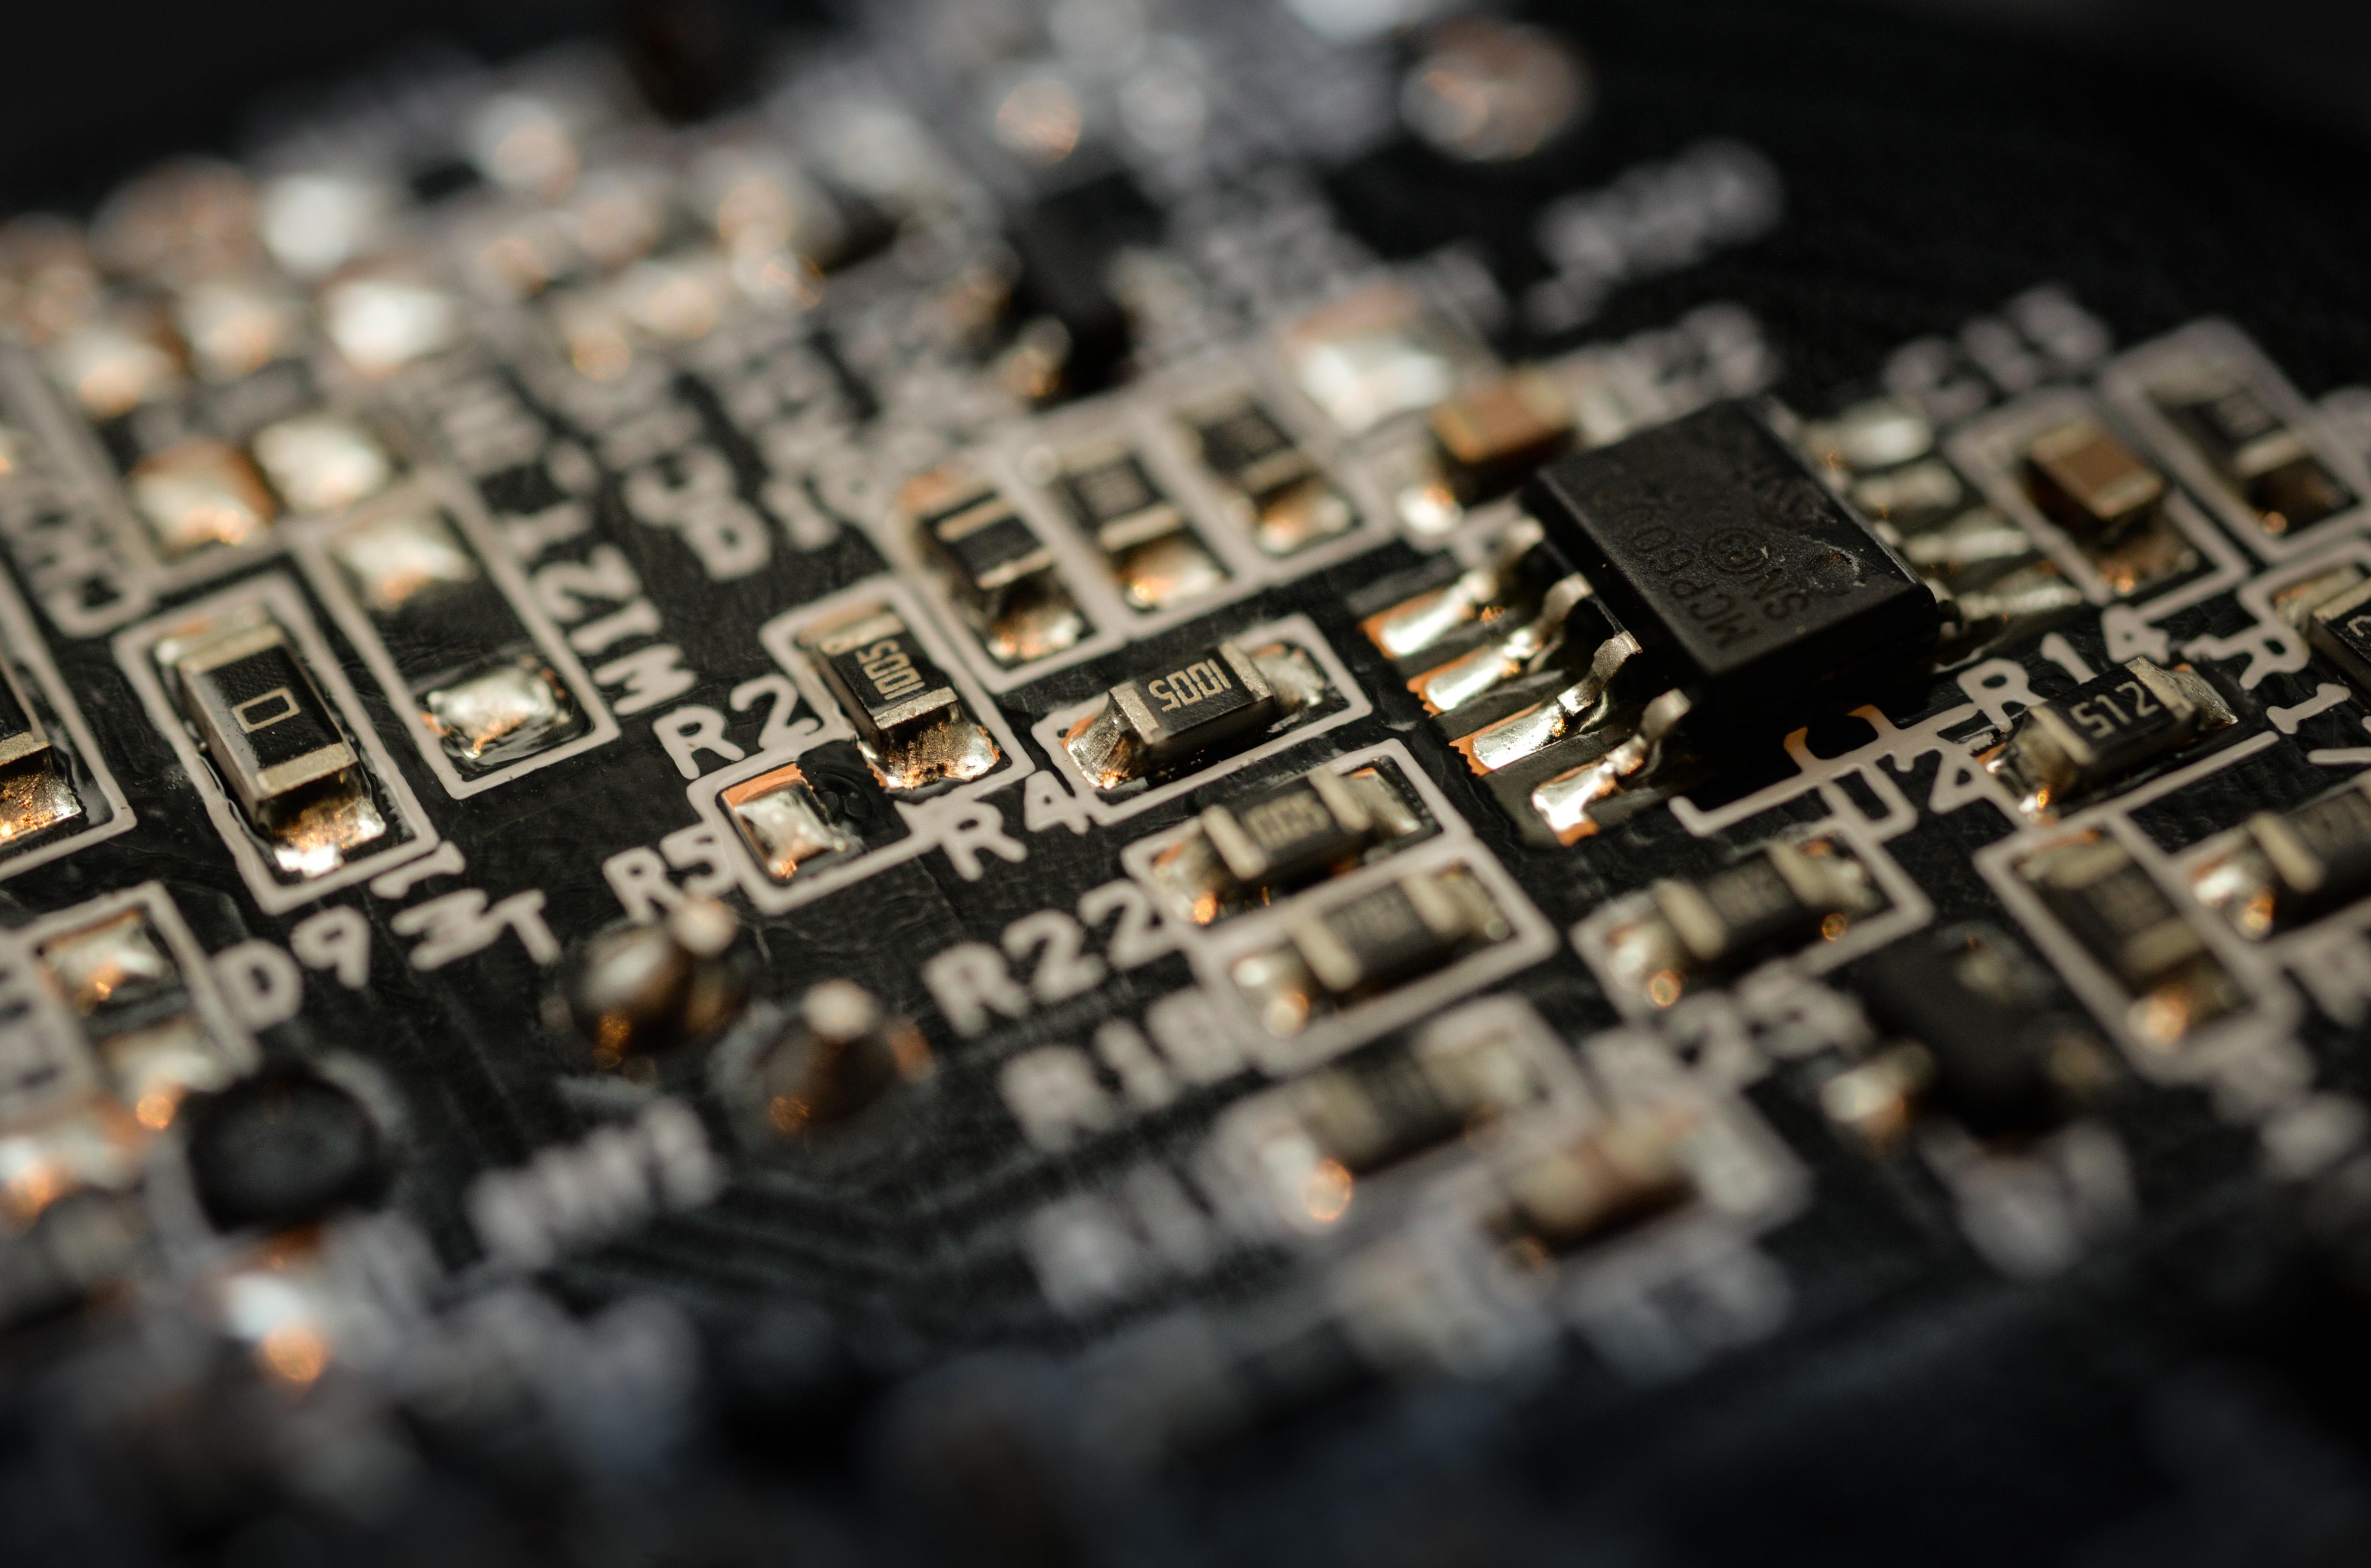 shallow-focus-photography-of-black-circuit-board-1448561.jpg